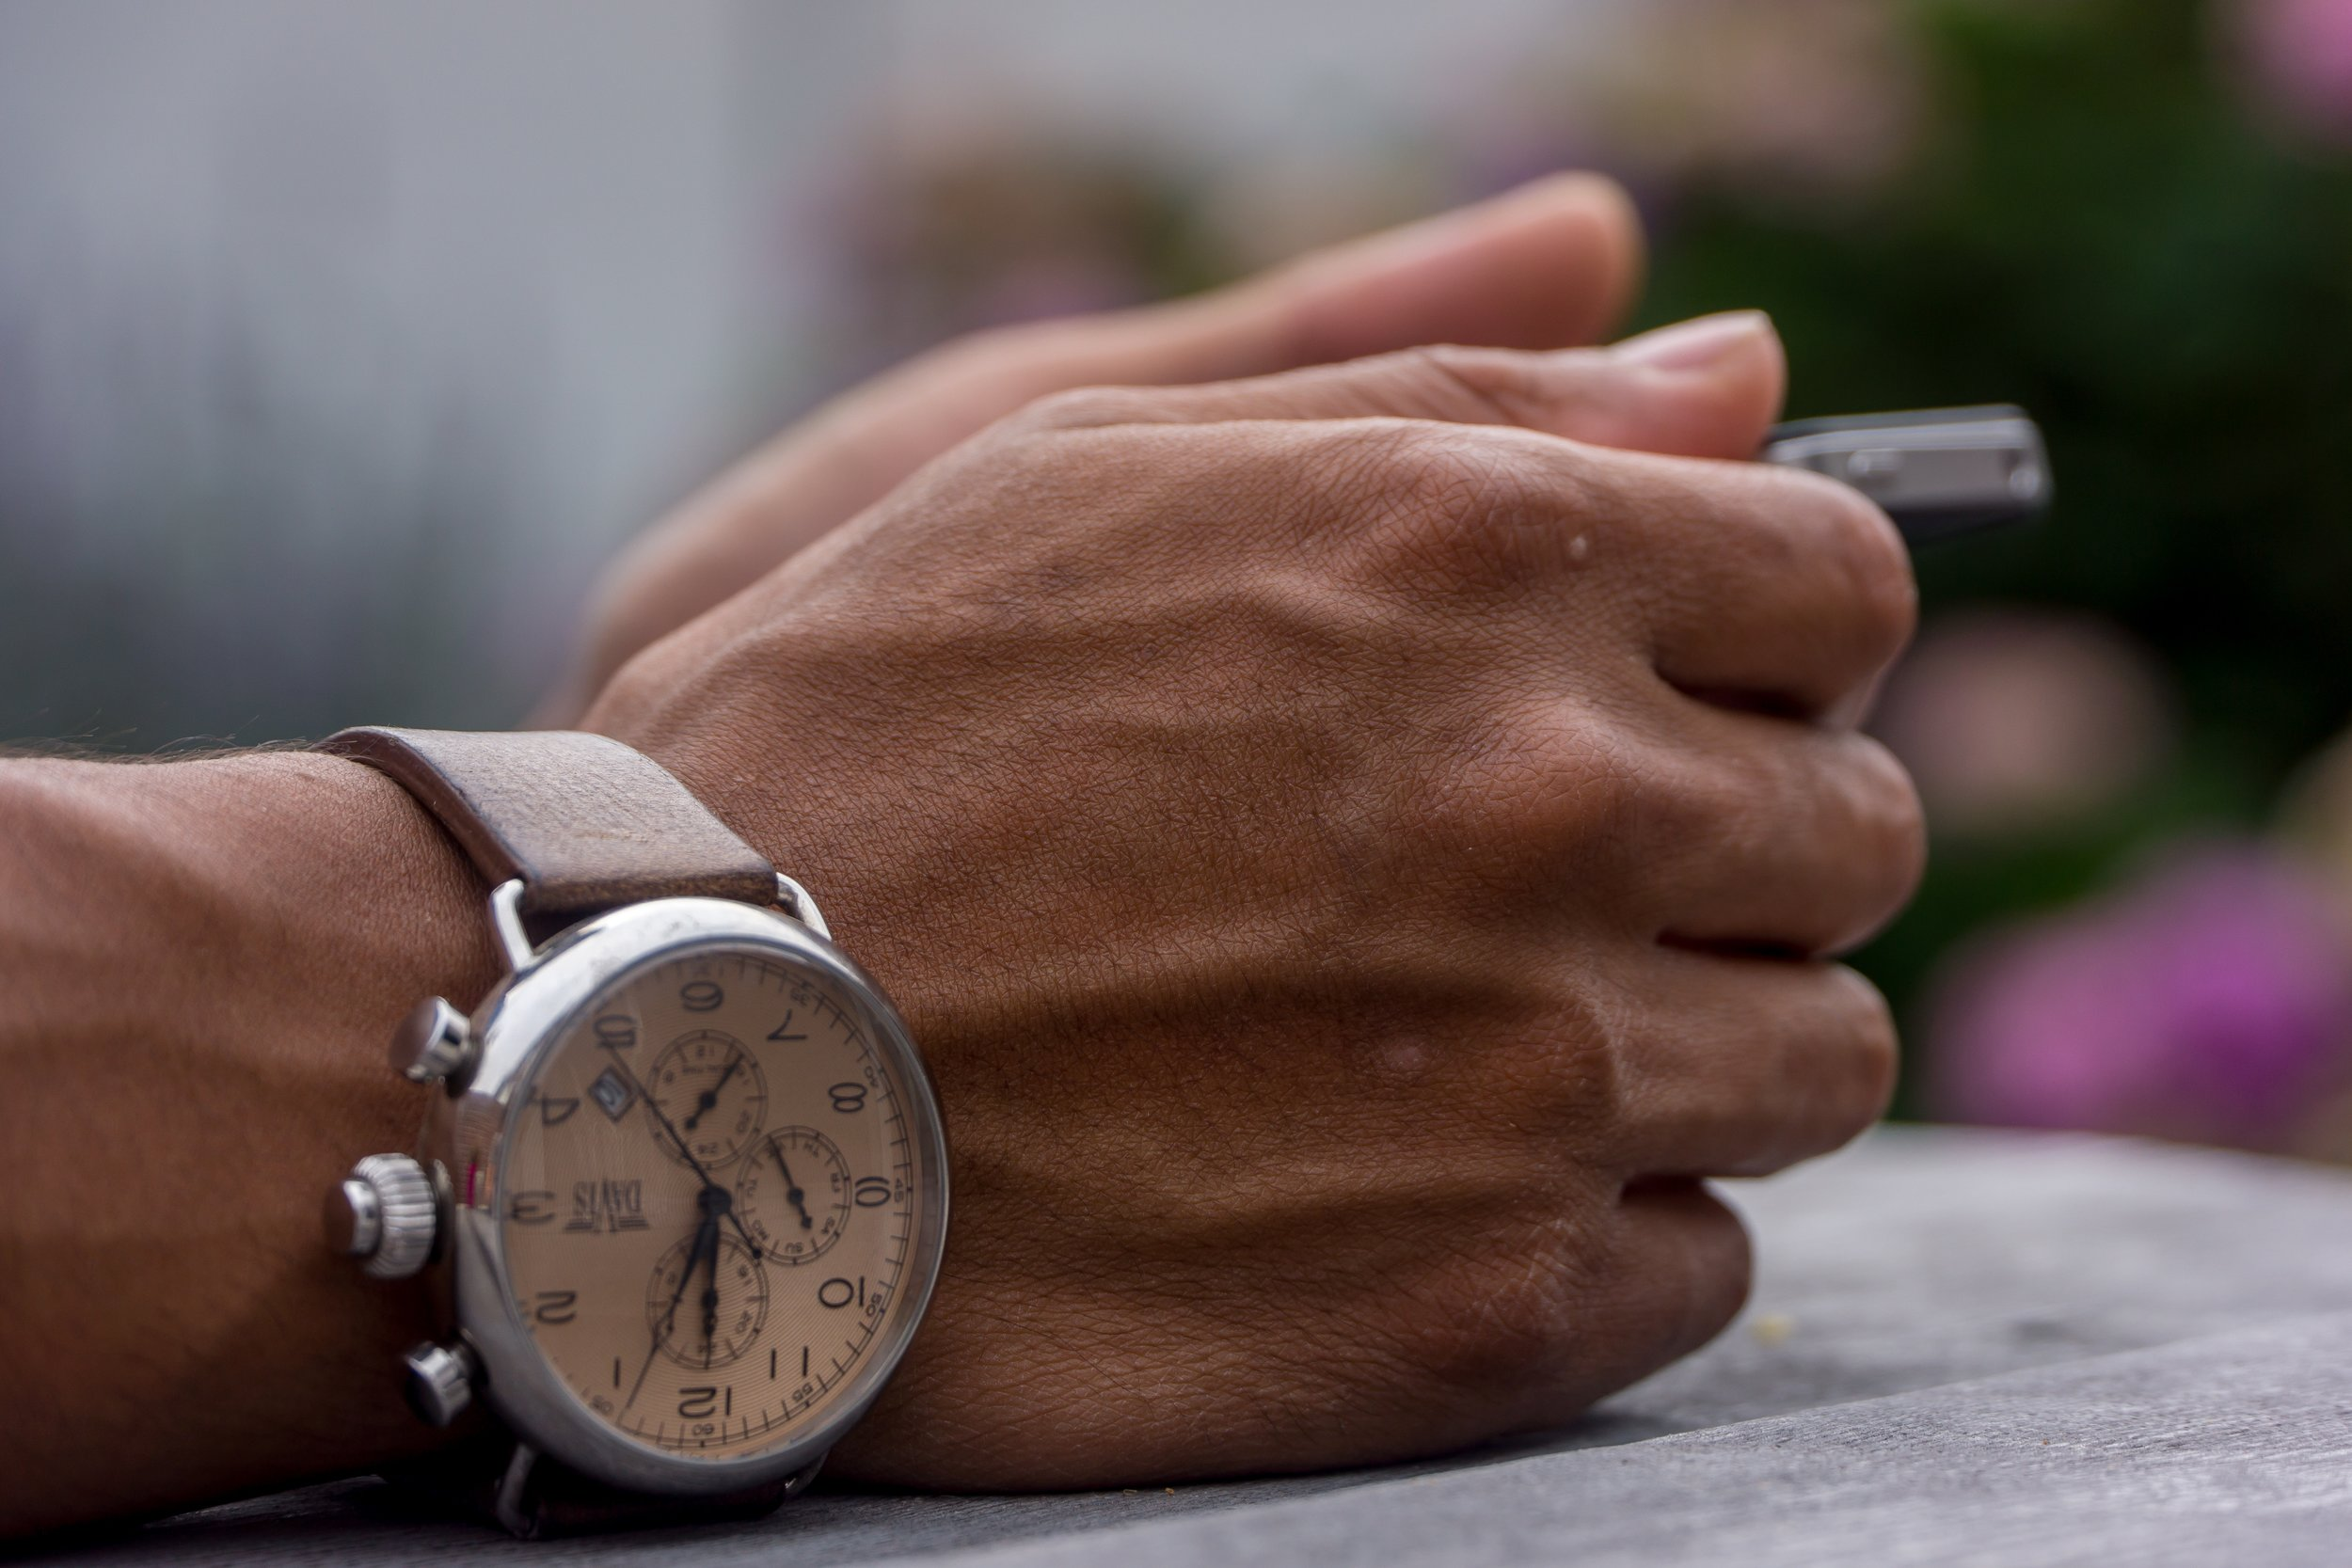 watch on wrist.jpg